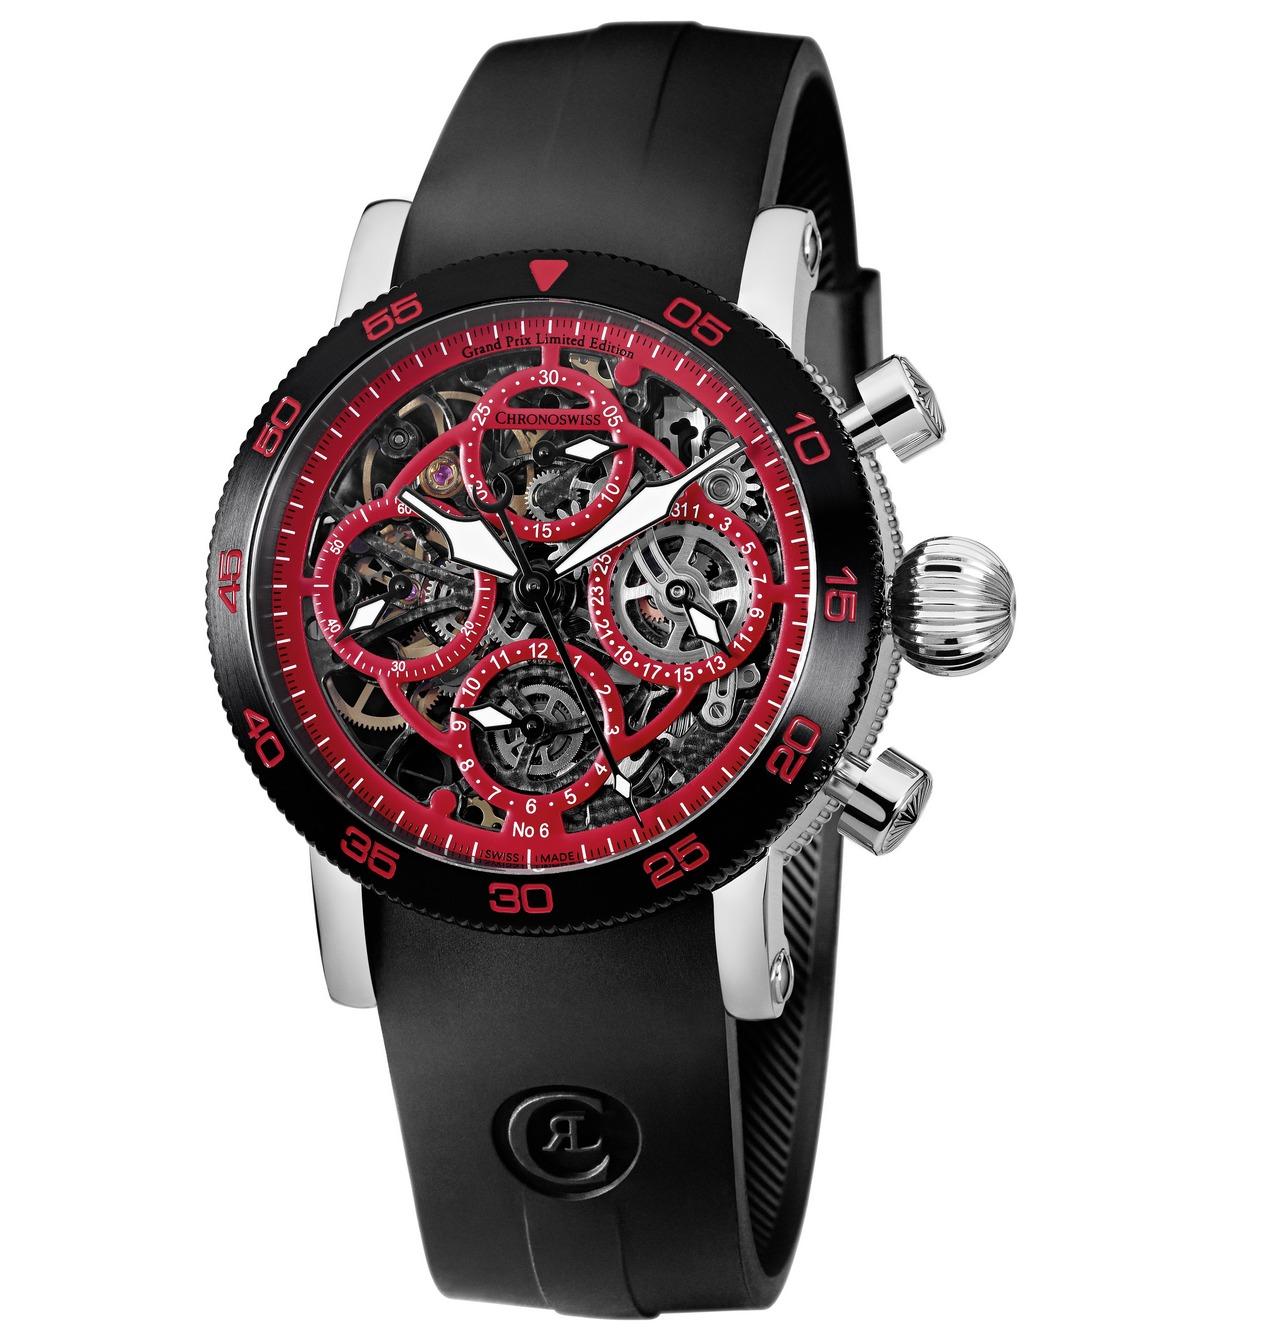 chronoswiss-timemaster-grand-prix-limited-edition_10-100